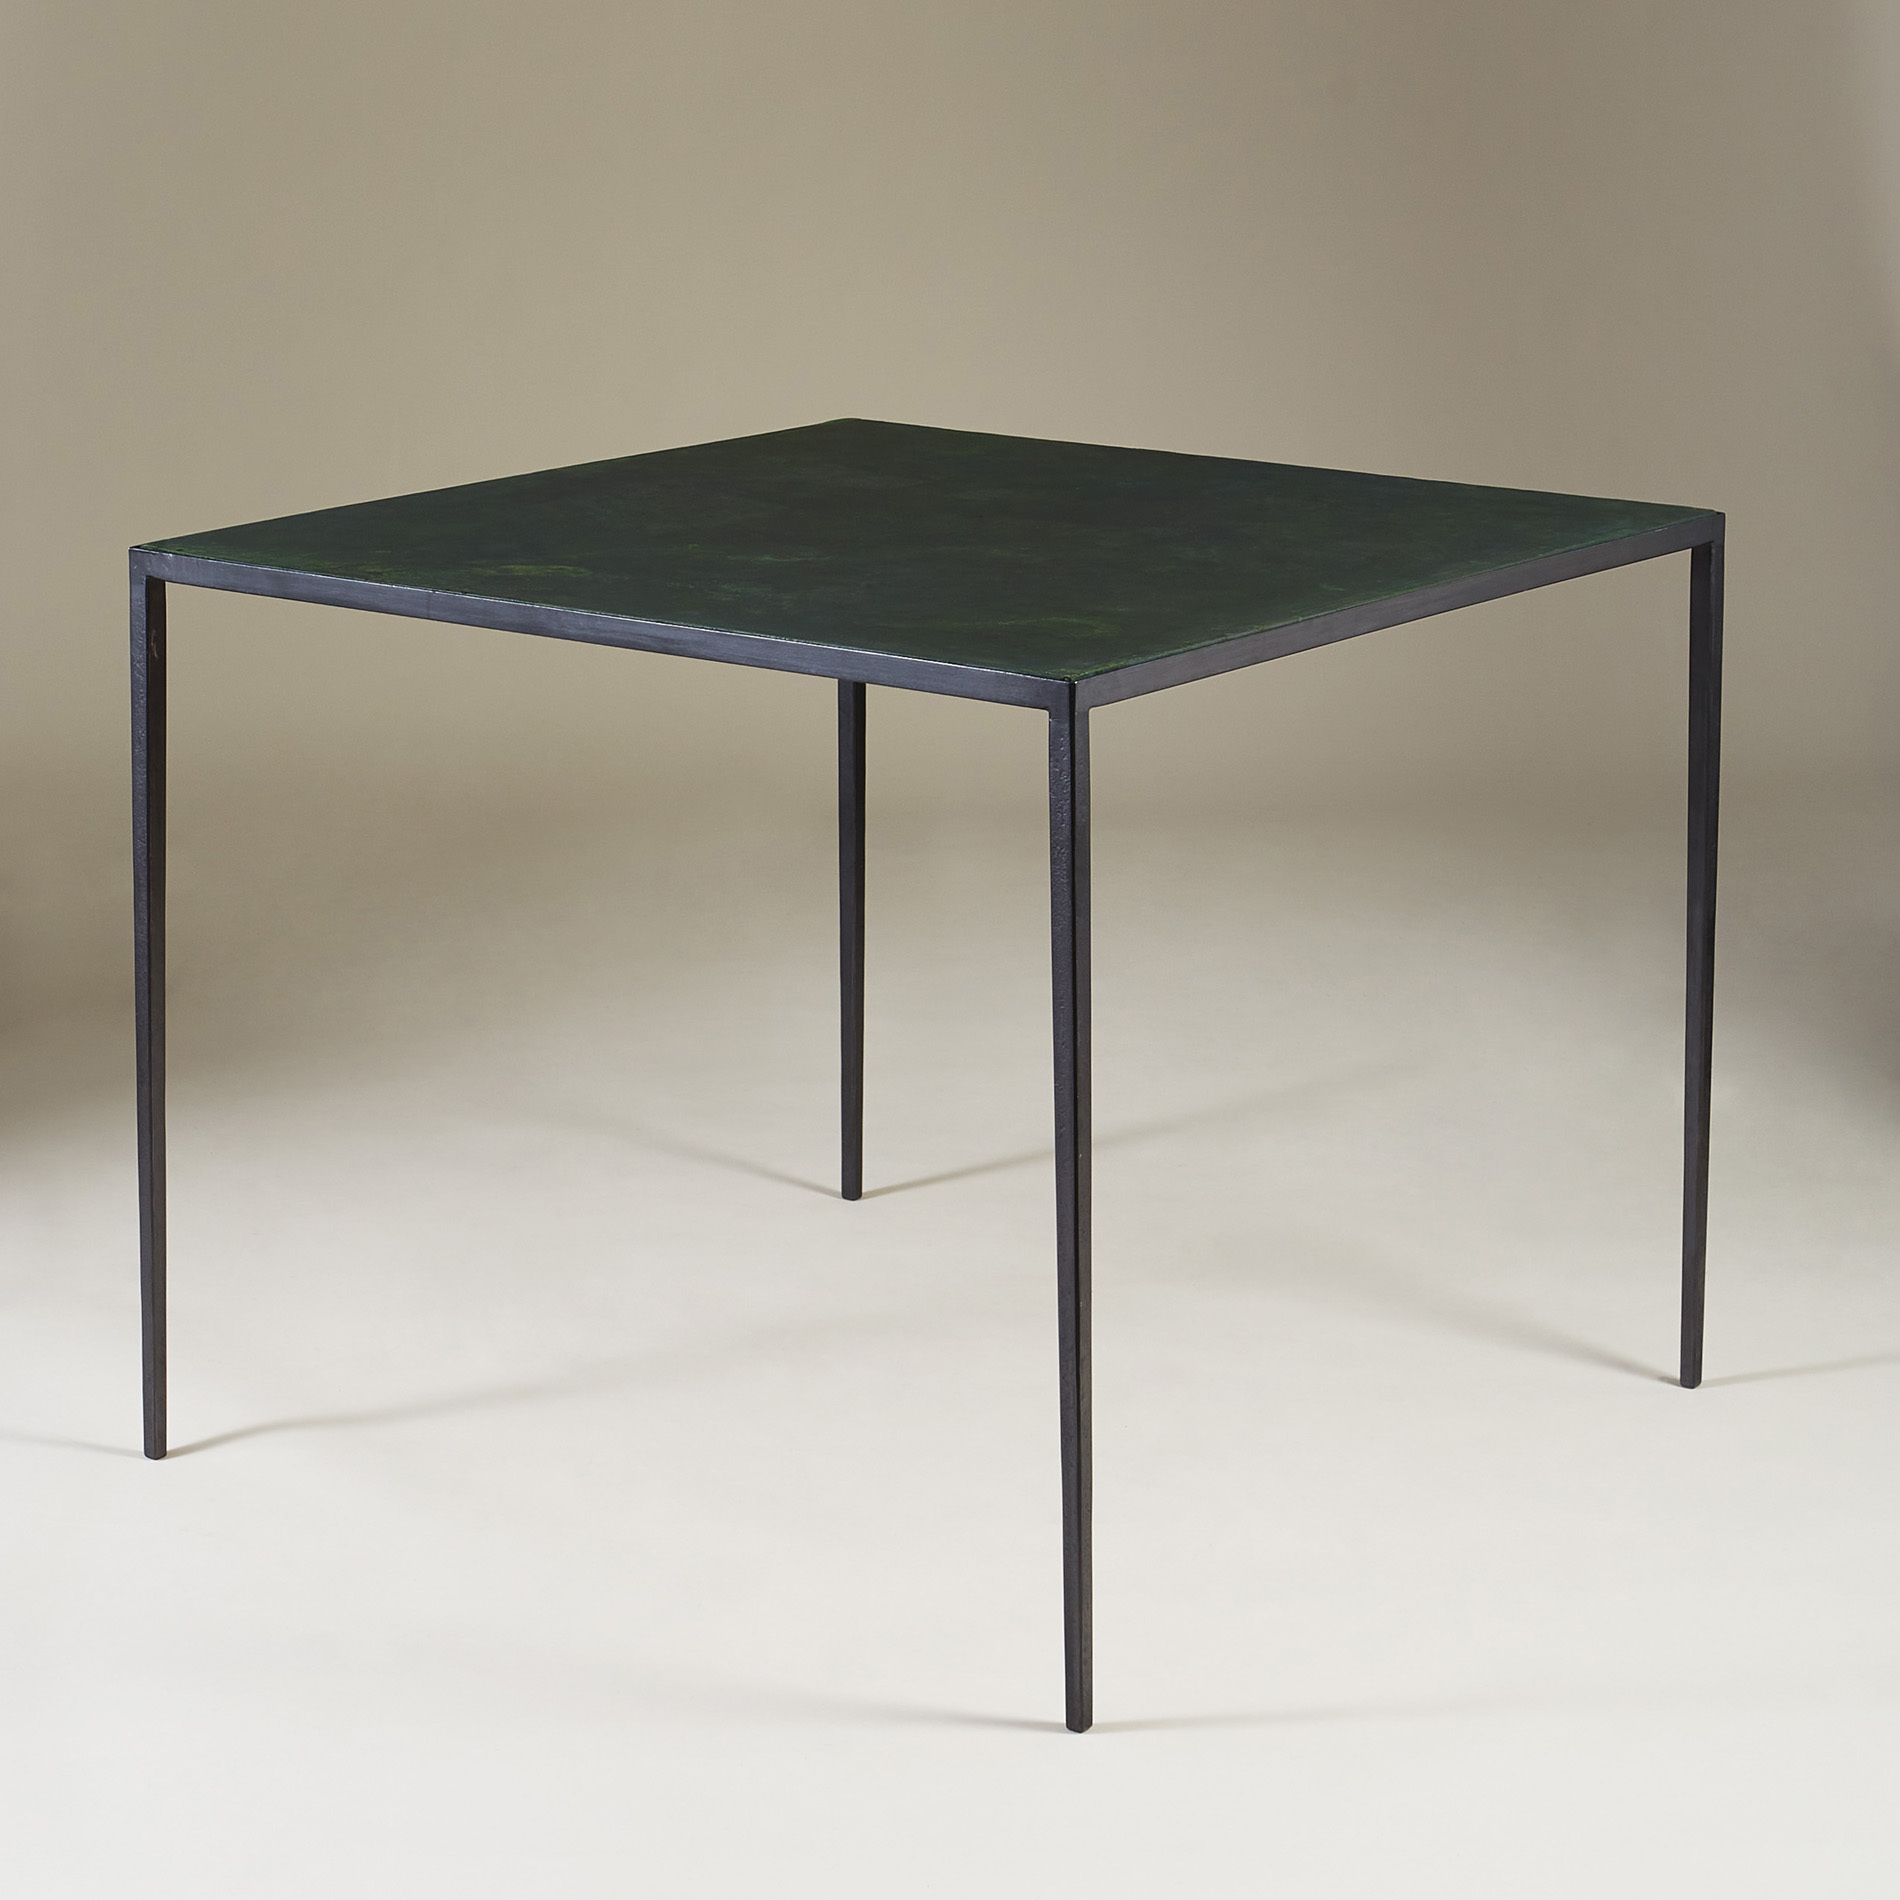 Jean Michel Frank Games Table 077 V1